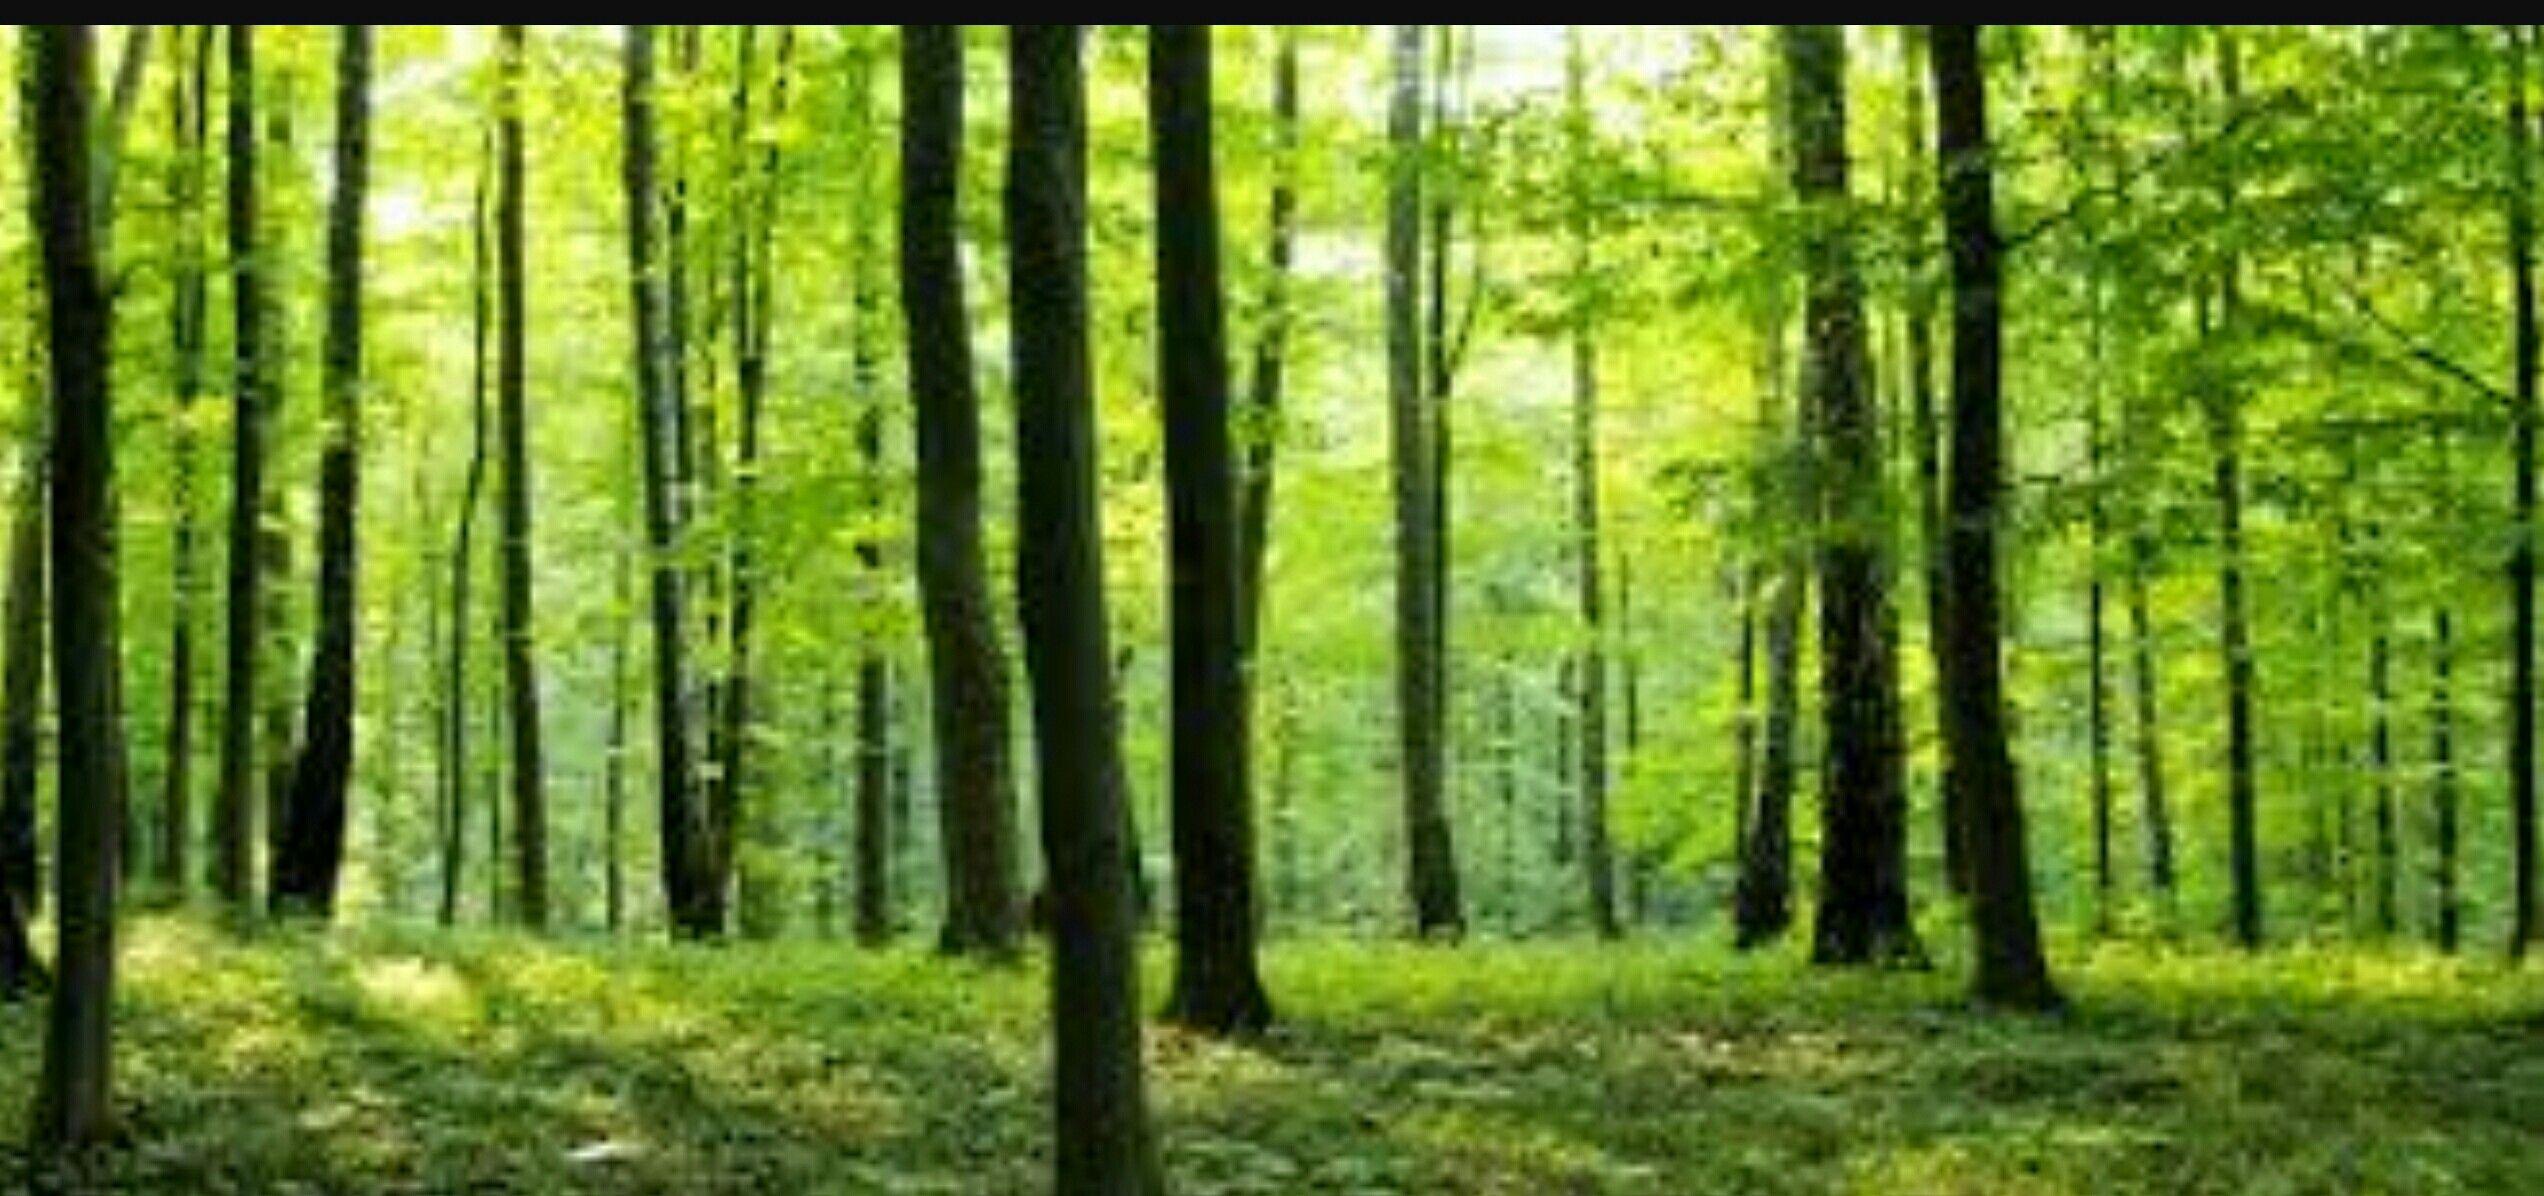 Association of Irish Forestry